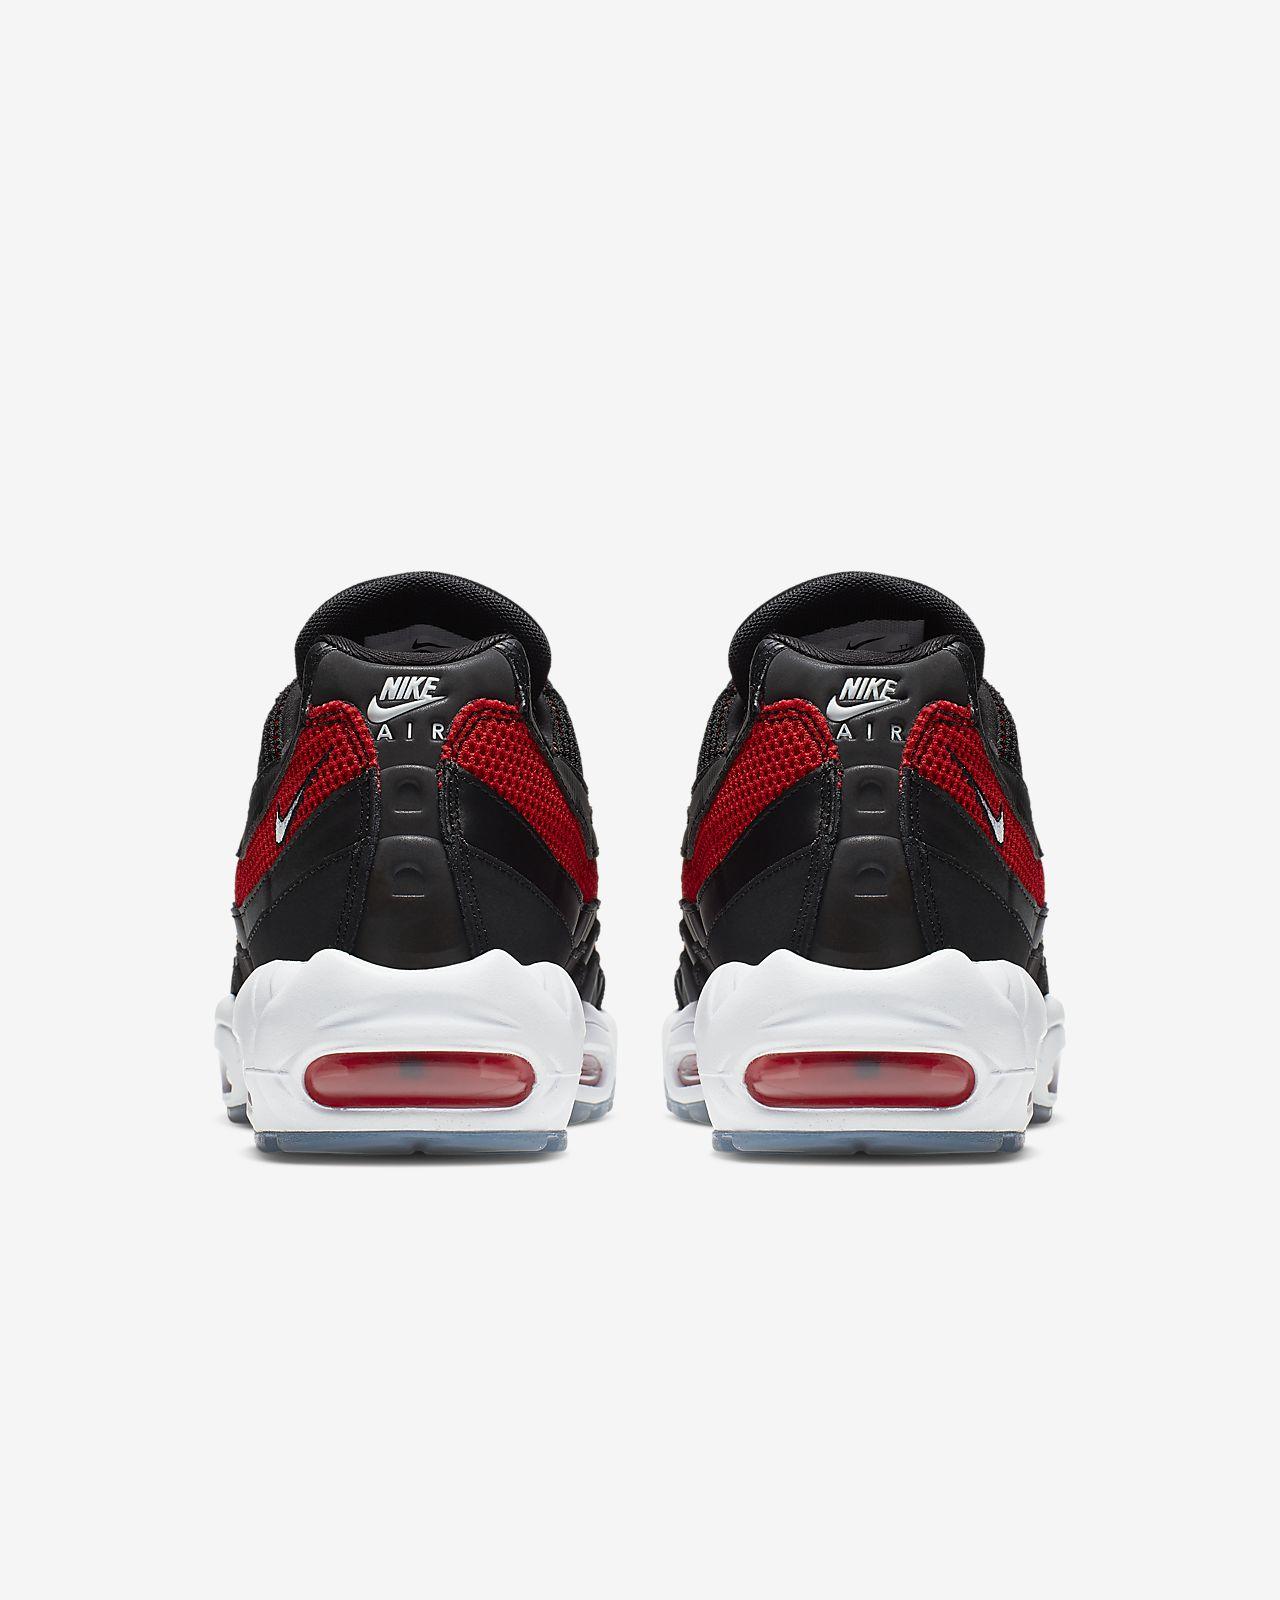 f54fafc364 Nike Air Max 95 Essential Men's Shoe. Nike.com GB